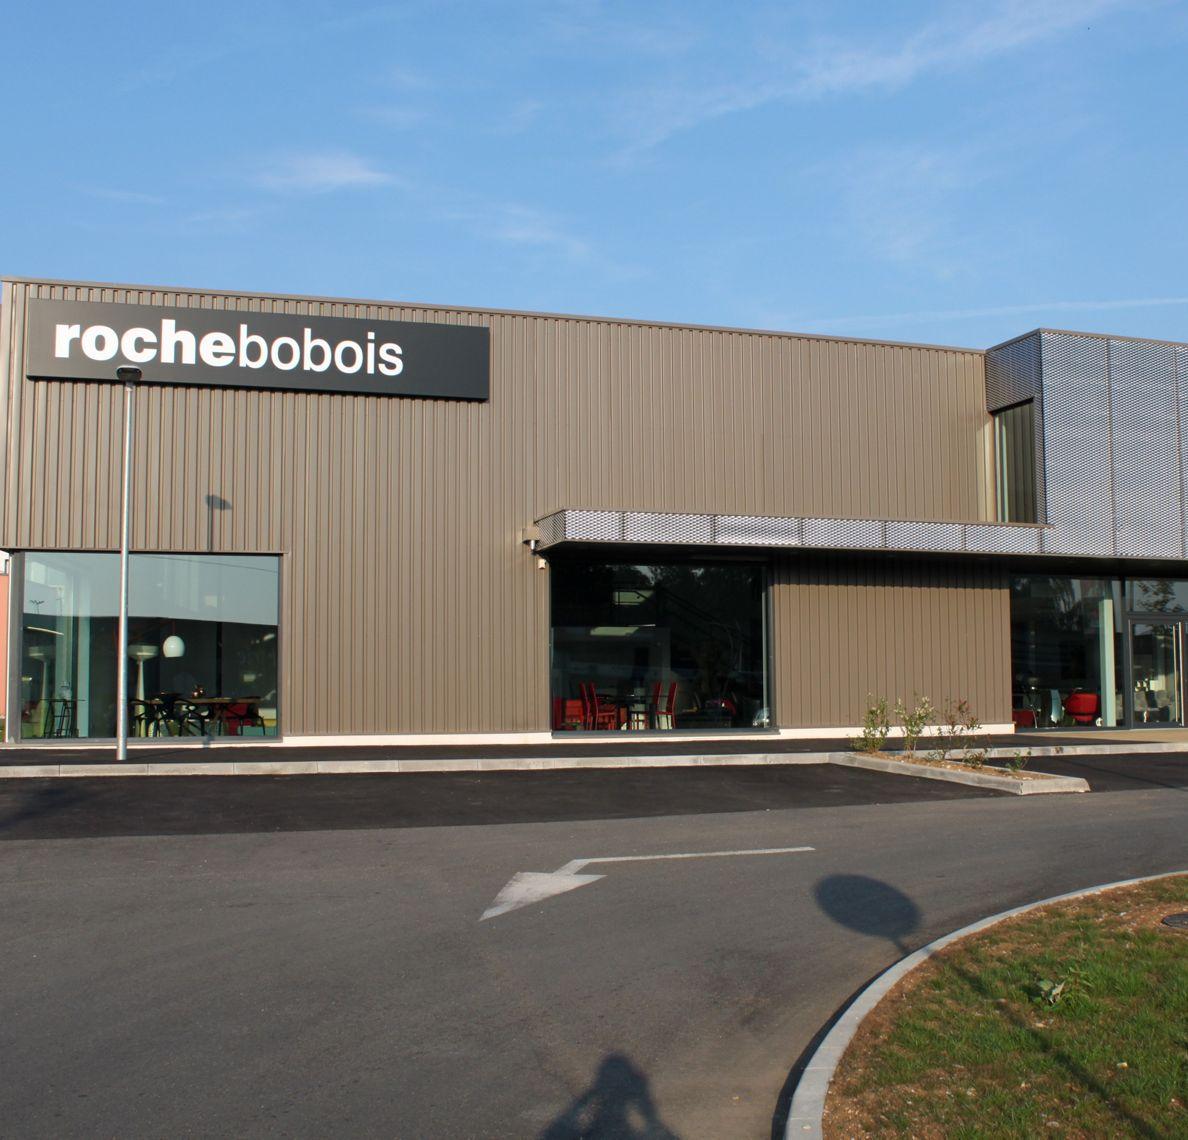 appntamento s magasin roche bobois belfort 90000. Black Bedroom Furniture Sets. Home Design Ideas